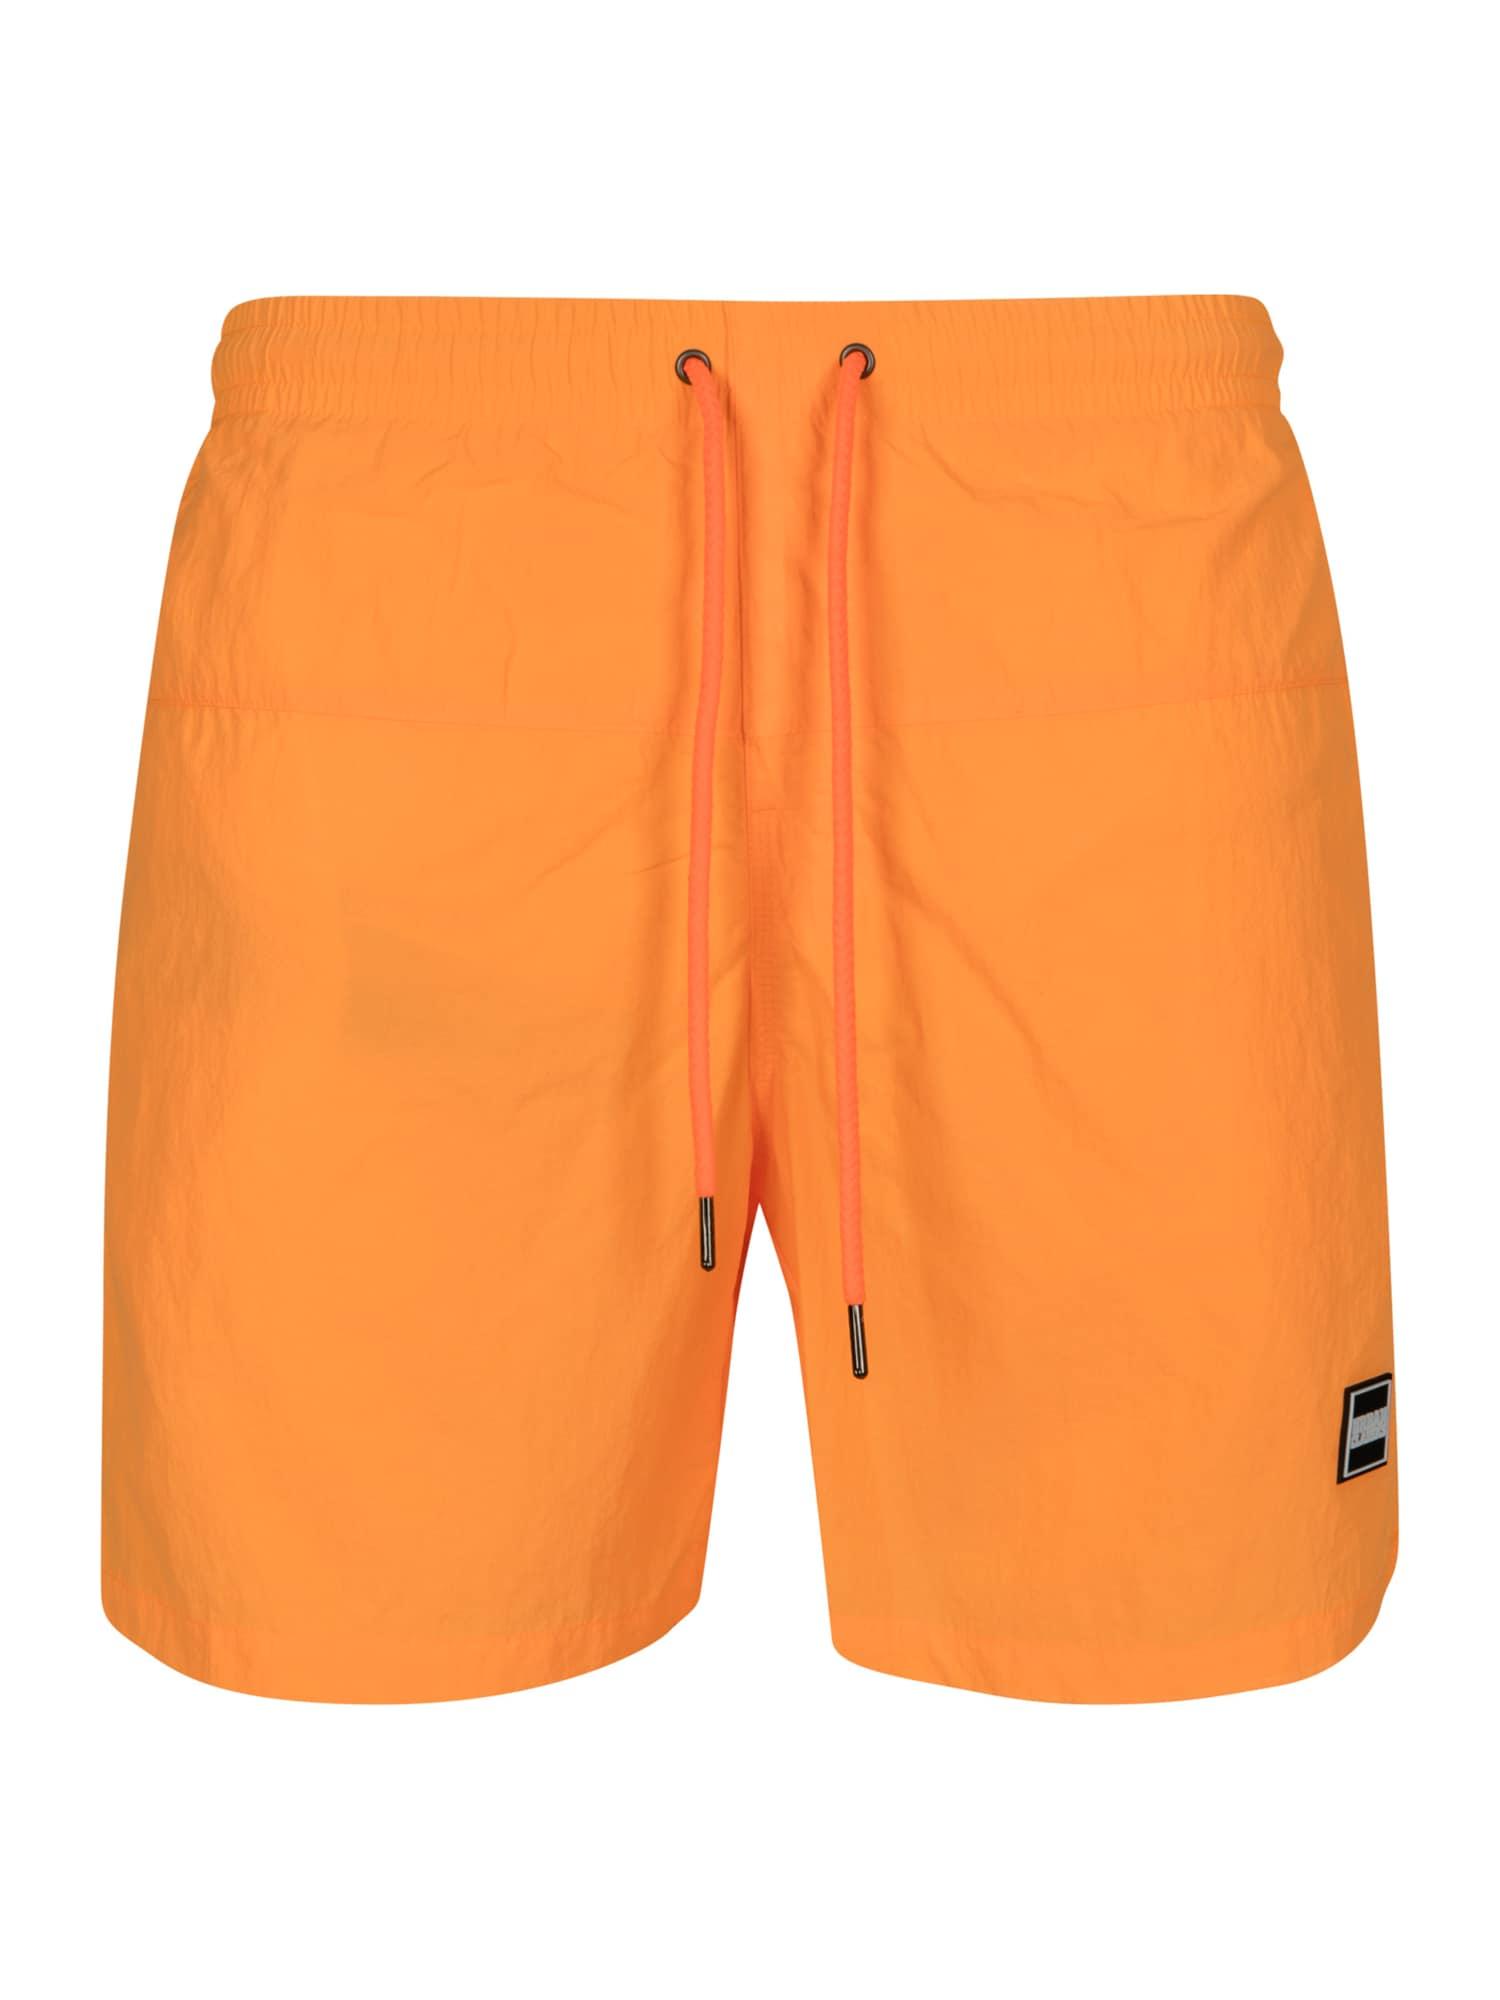 Urban Classics Shorts de bain  - Orange - Taille: M - male